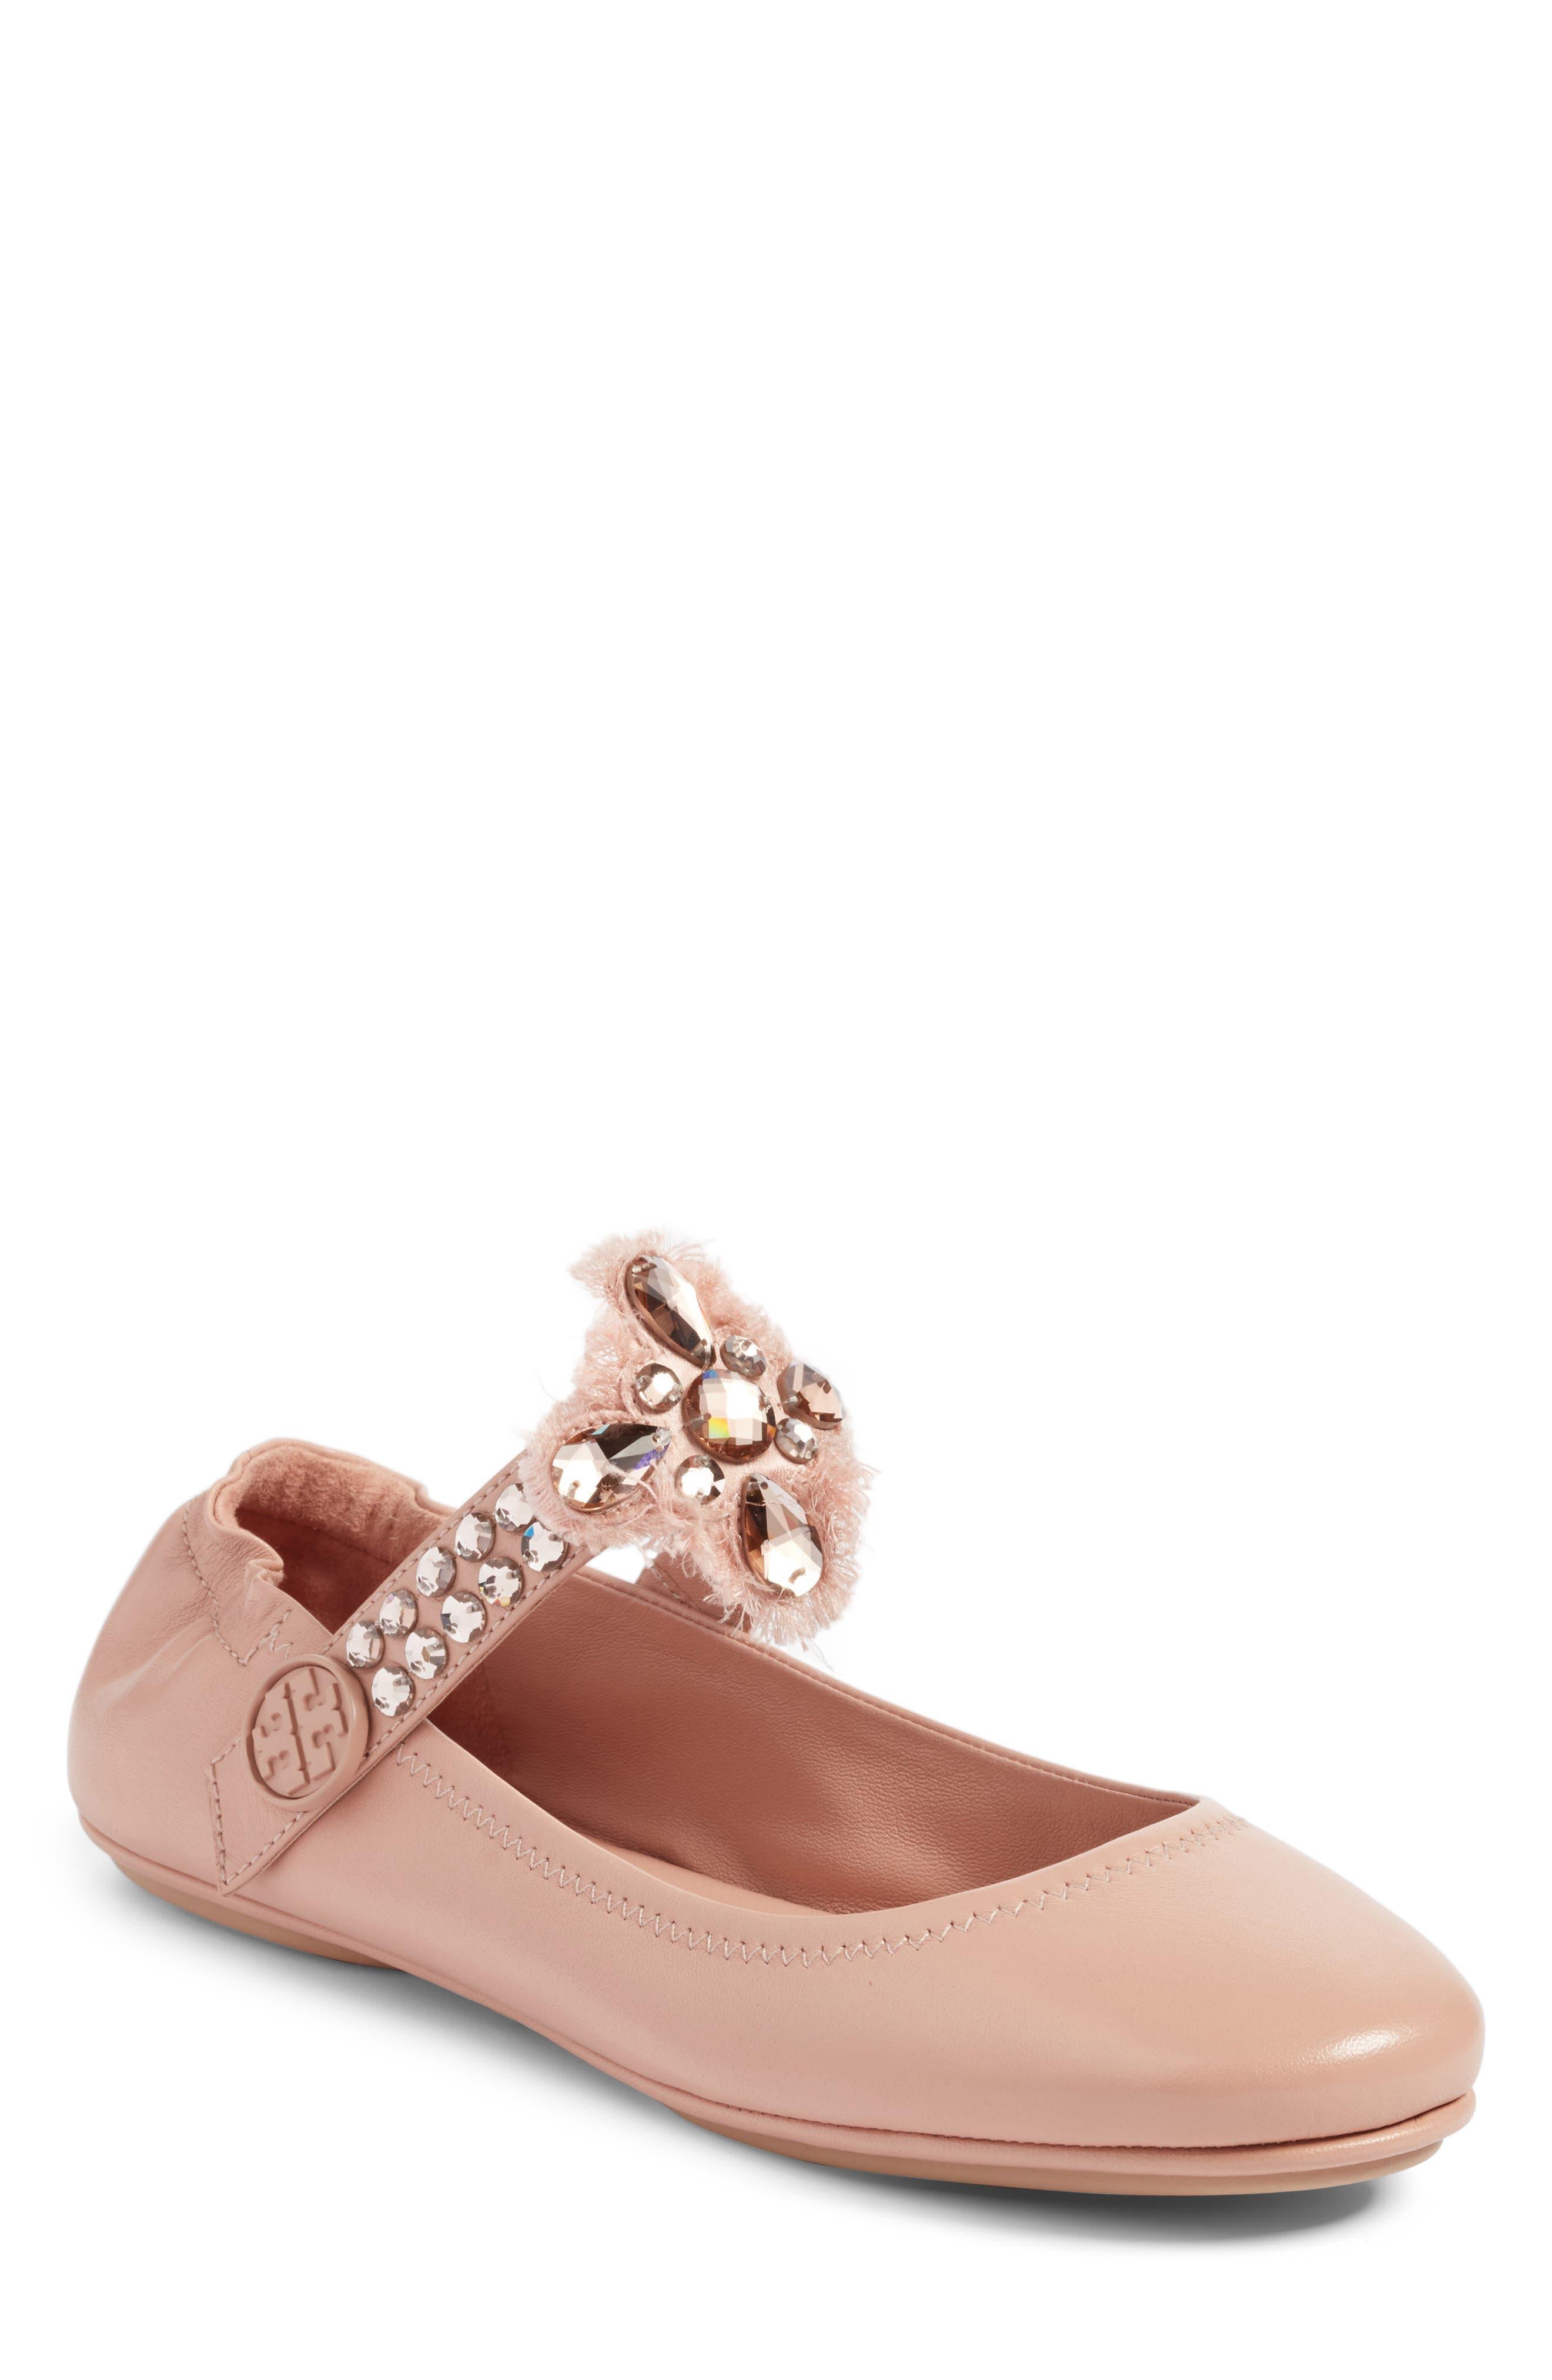 Main Image - Tory Burch Minnie Embellished Convertible Strap Ballet Flat (Women)